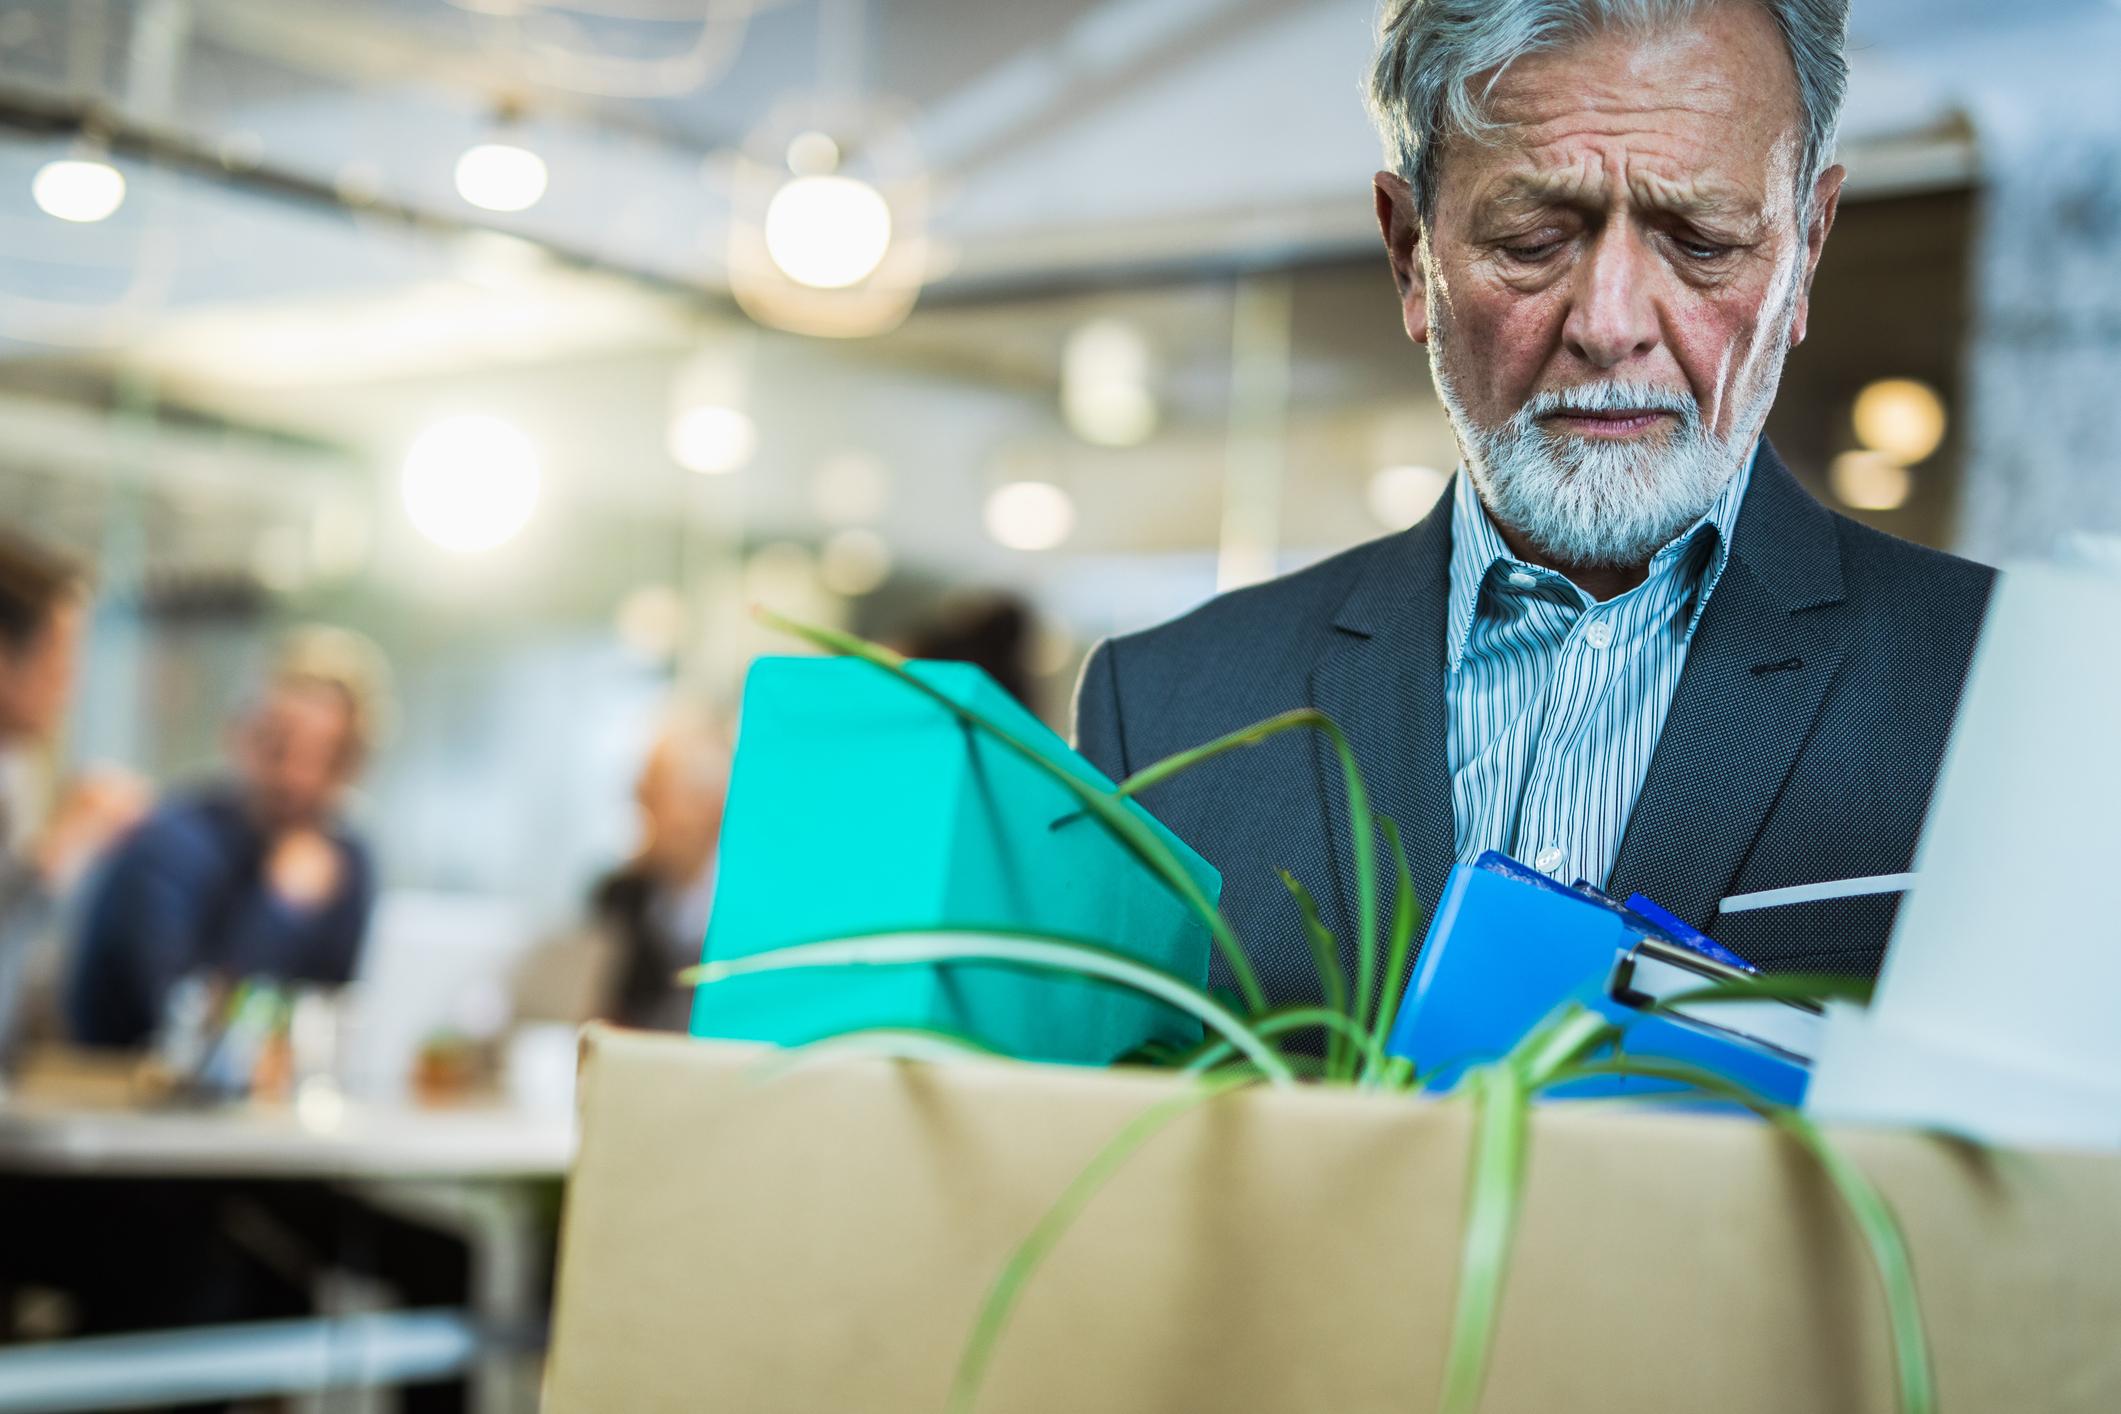 4 Senior Executives Are Leaving Sanofi Following New CEO's Strategic Overhaul   The Motley Fool